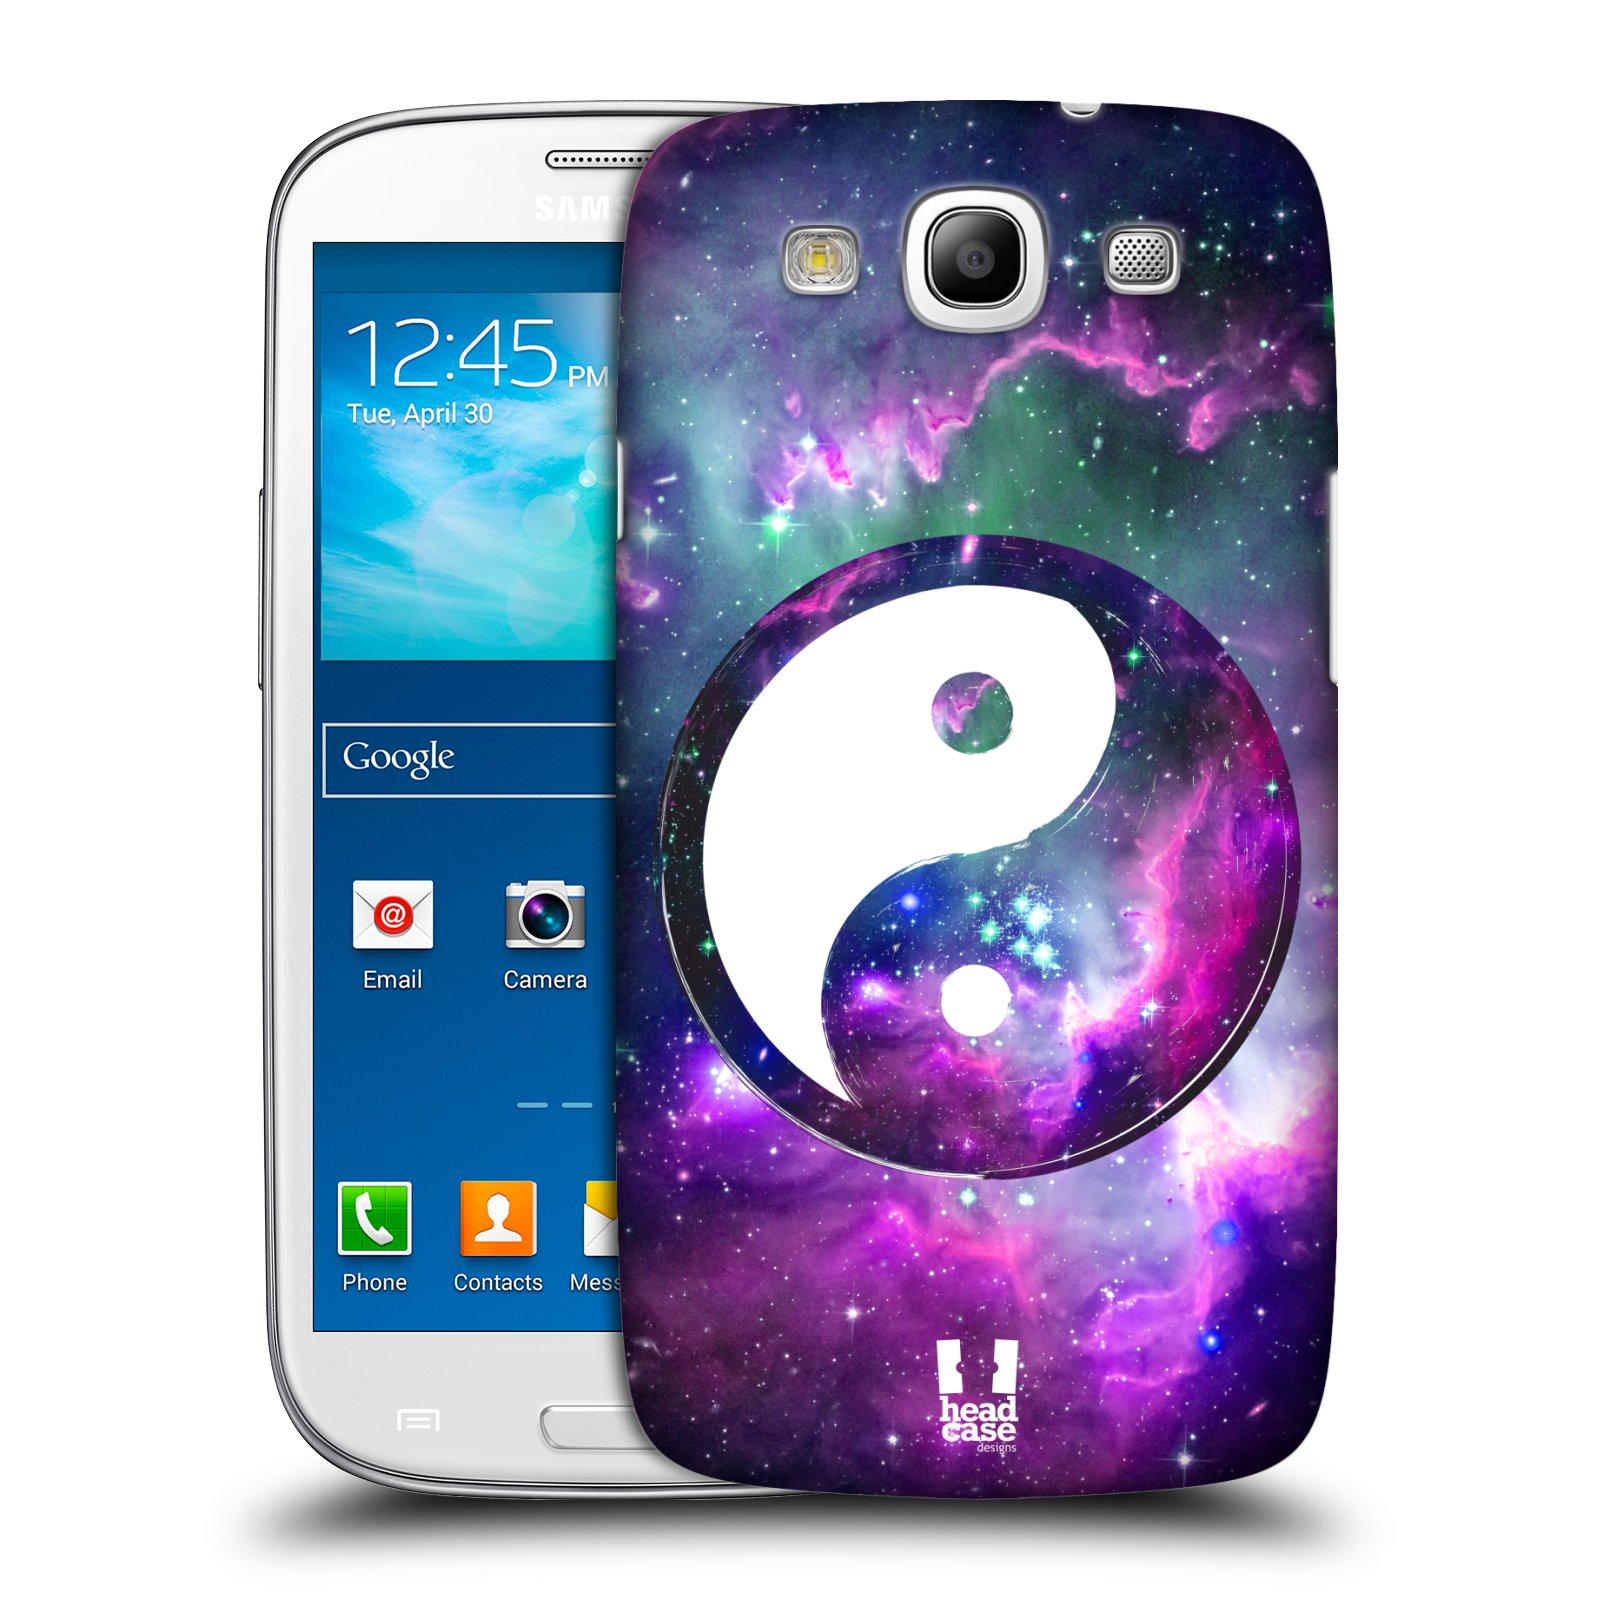 Plastové pouzdro na mobil Samsung Galaxy S3 Neo HEAD CASE Yin a Yang PURPLE